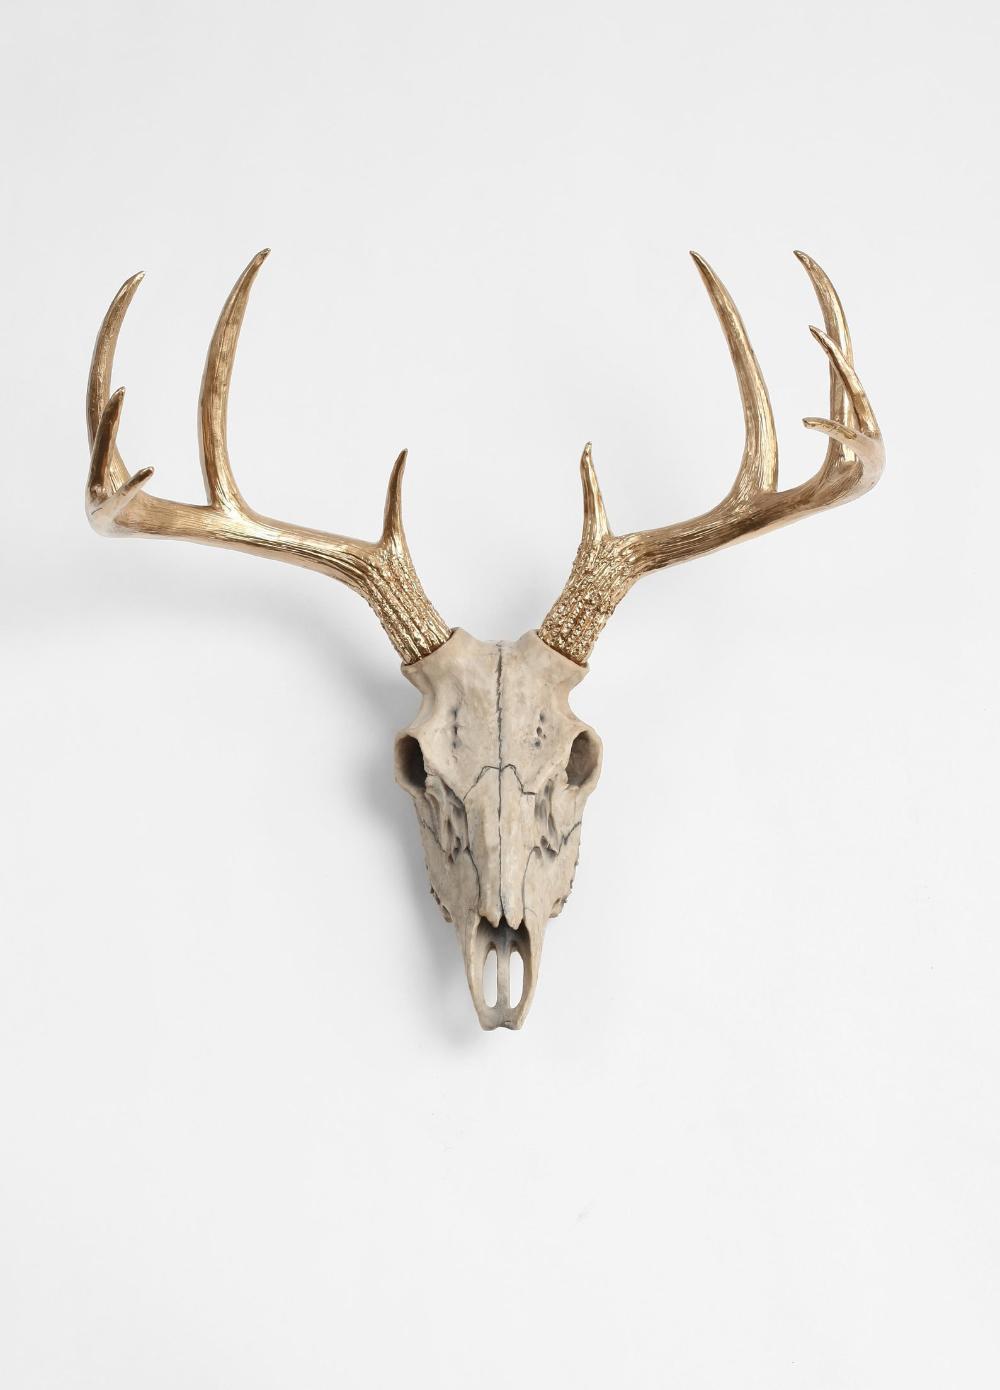 Natural Deer Skull W Gold Antlers Faux Deer Animal Skull Etsy Deer Skulls Animal Skulls Animal Skull Decor